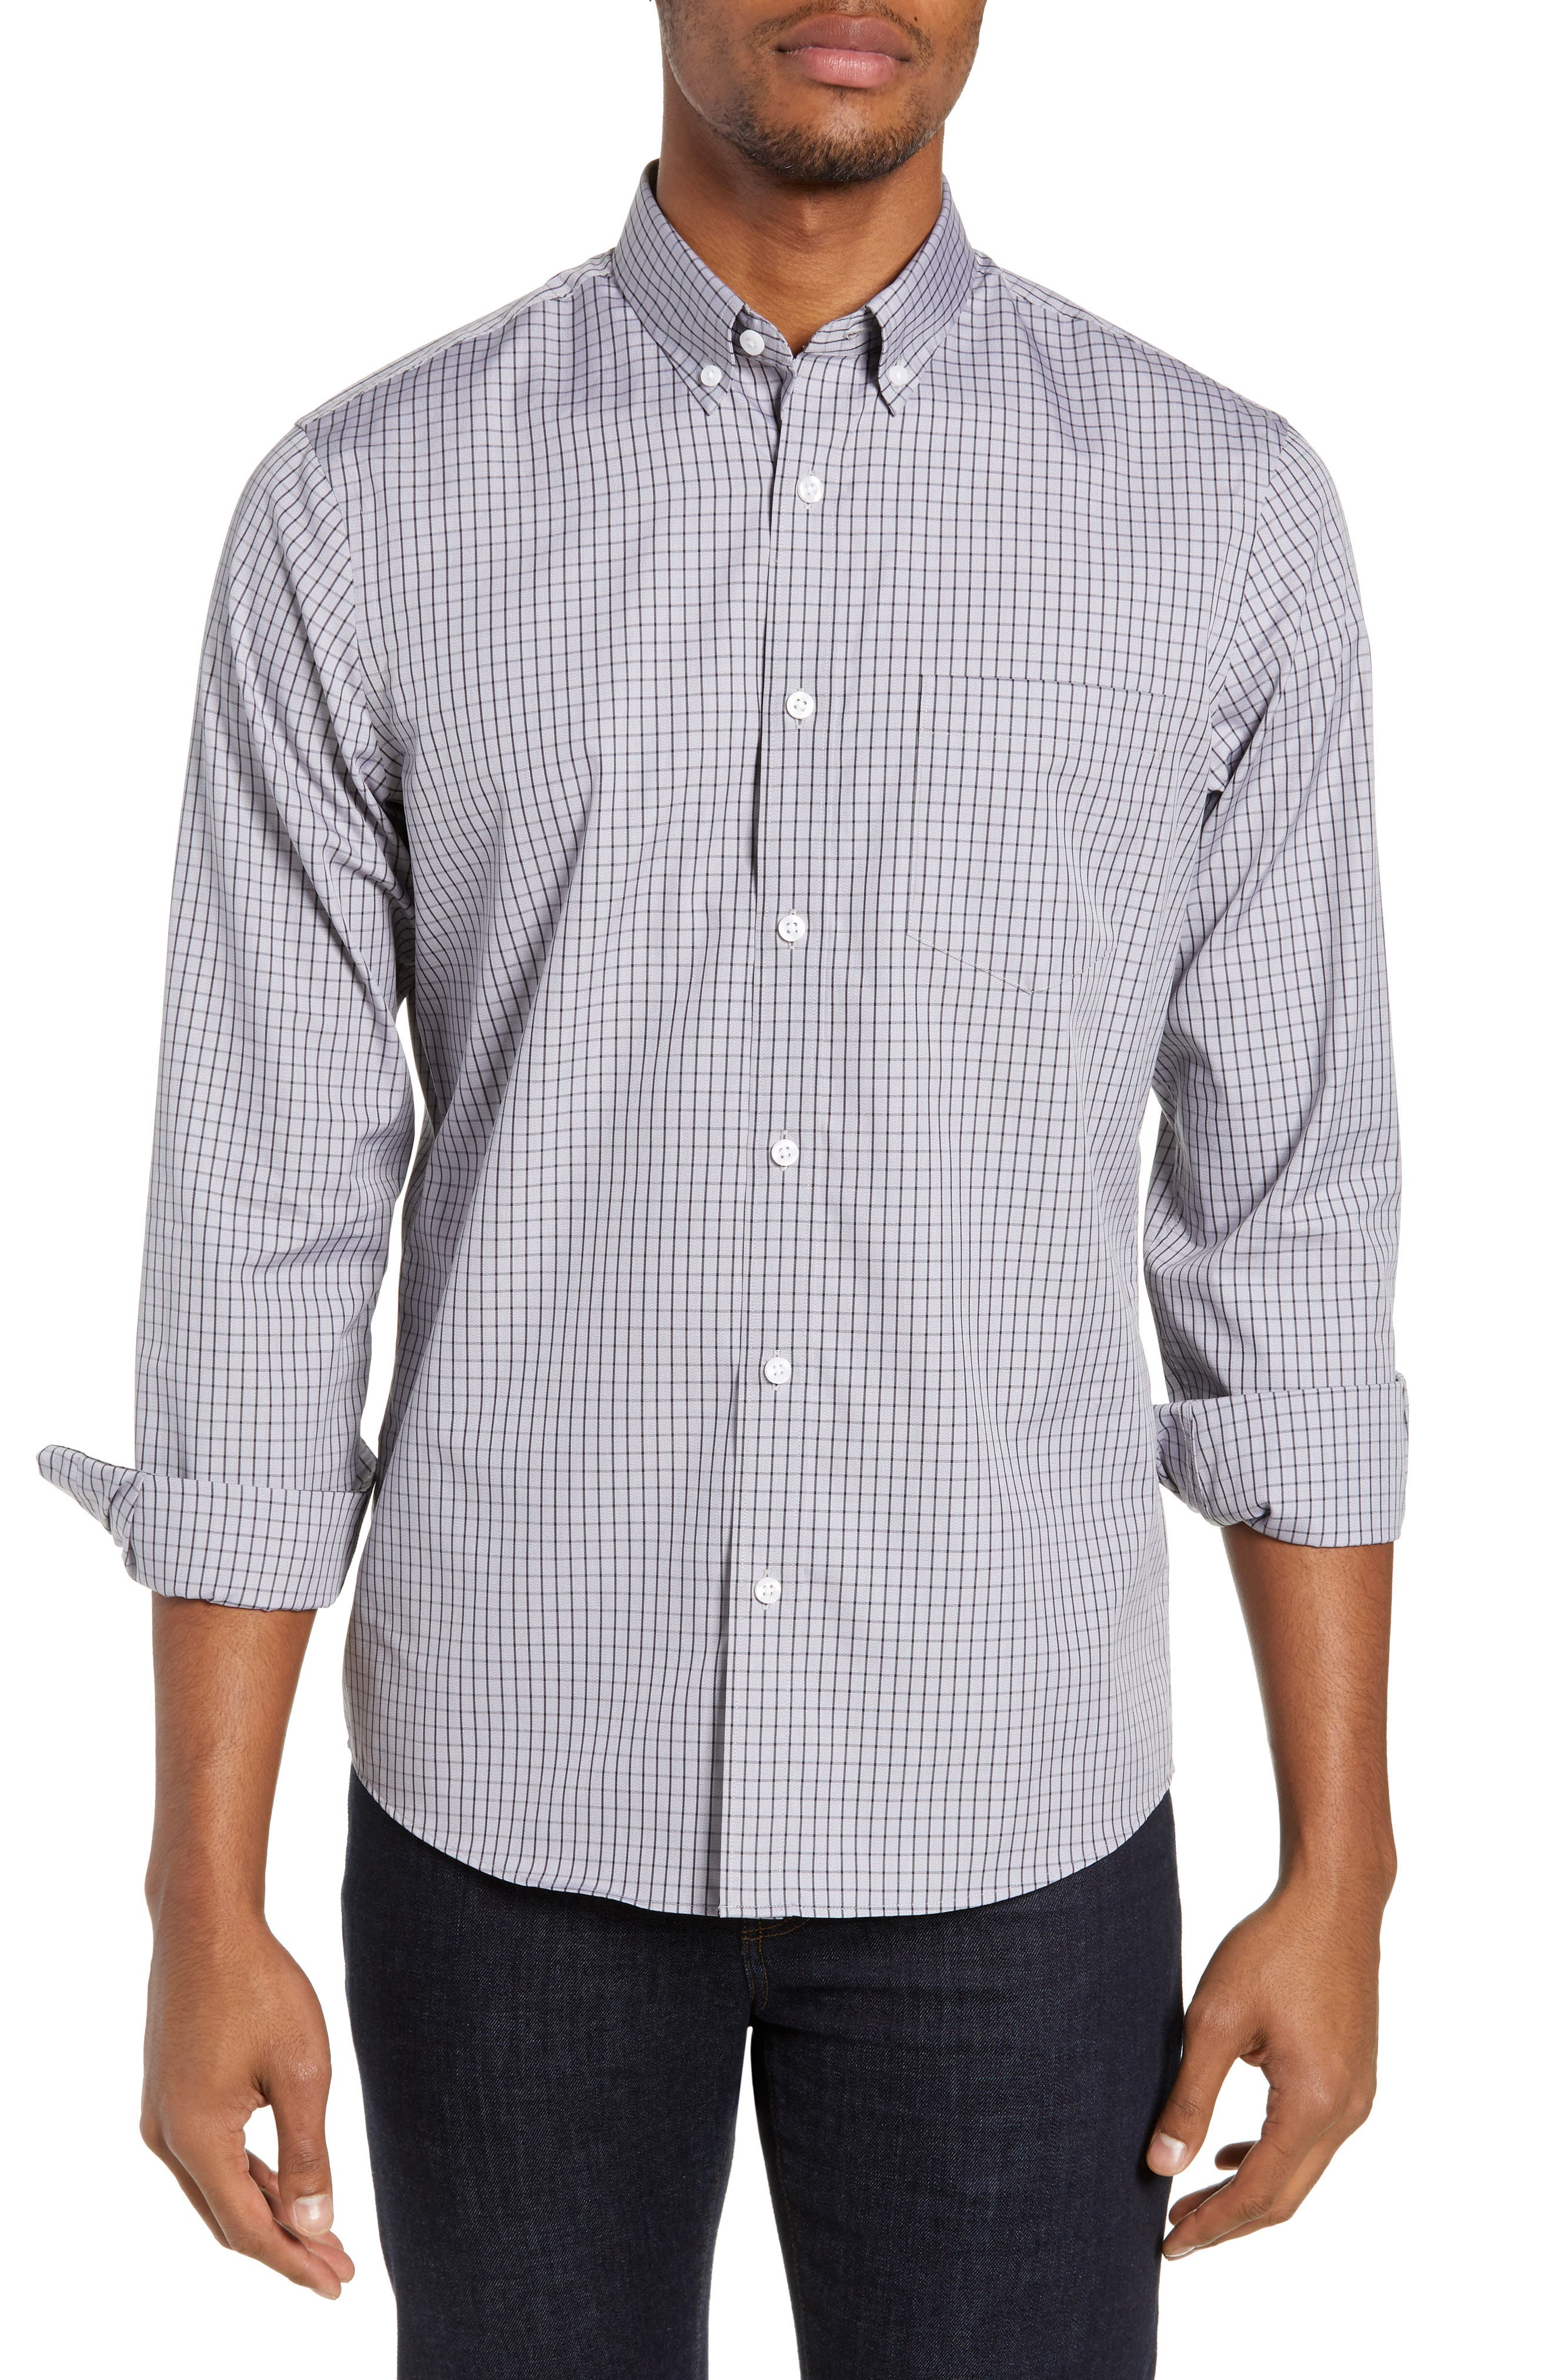 NORDSTROM MEN'S SHOP Trim Fit Non-Iron Check Sport Shirt, Main, color, GREY FILIGREE MINIGRID